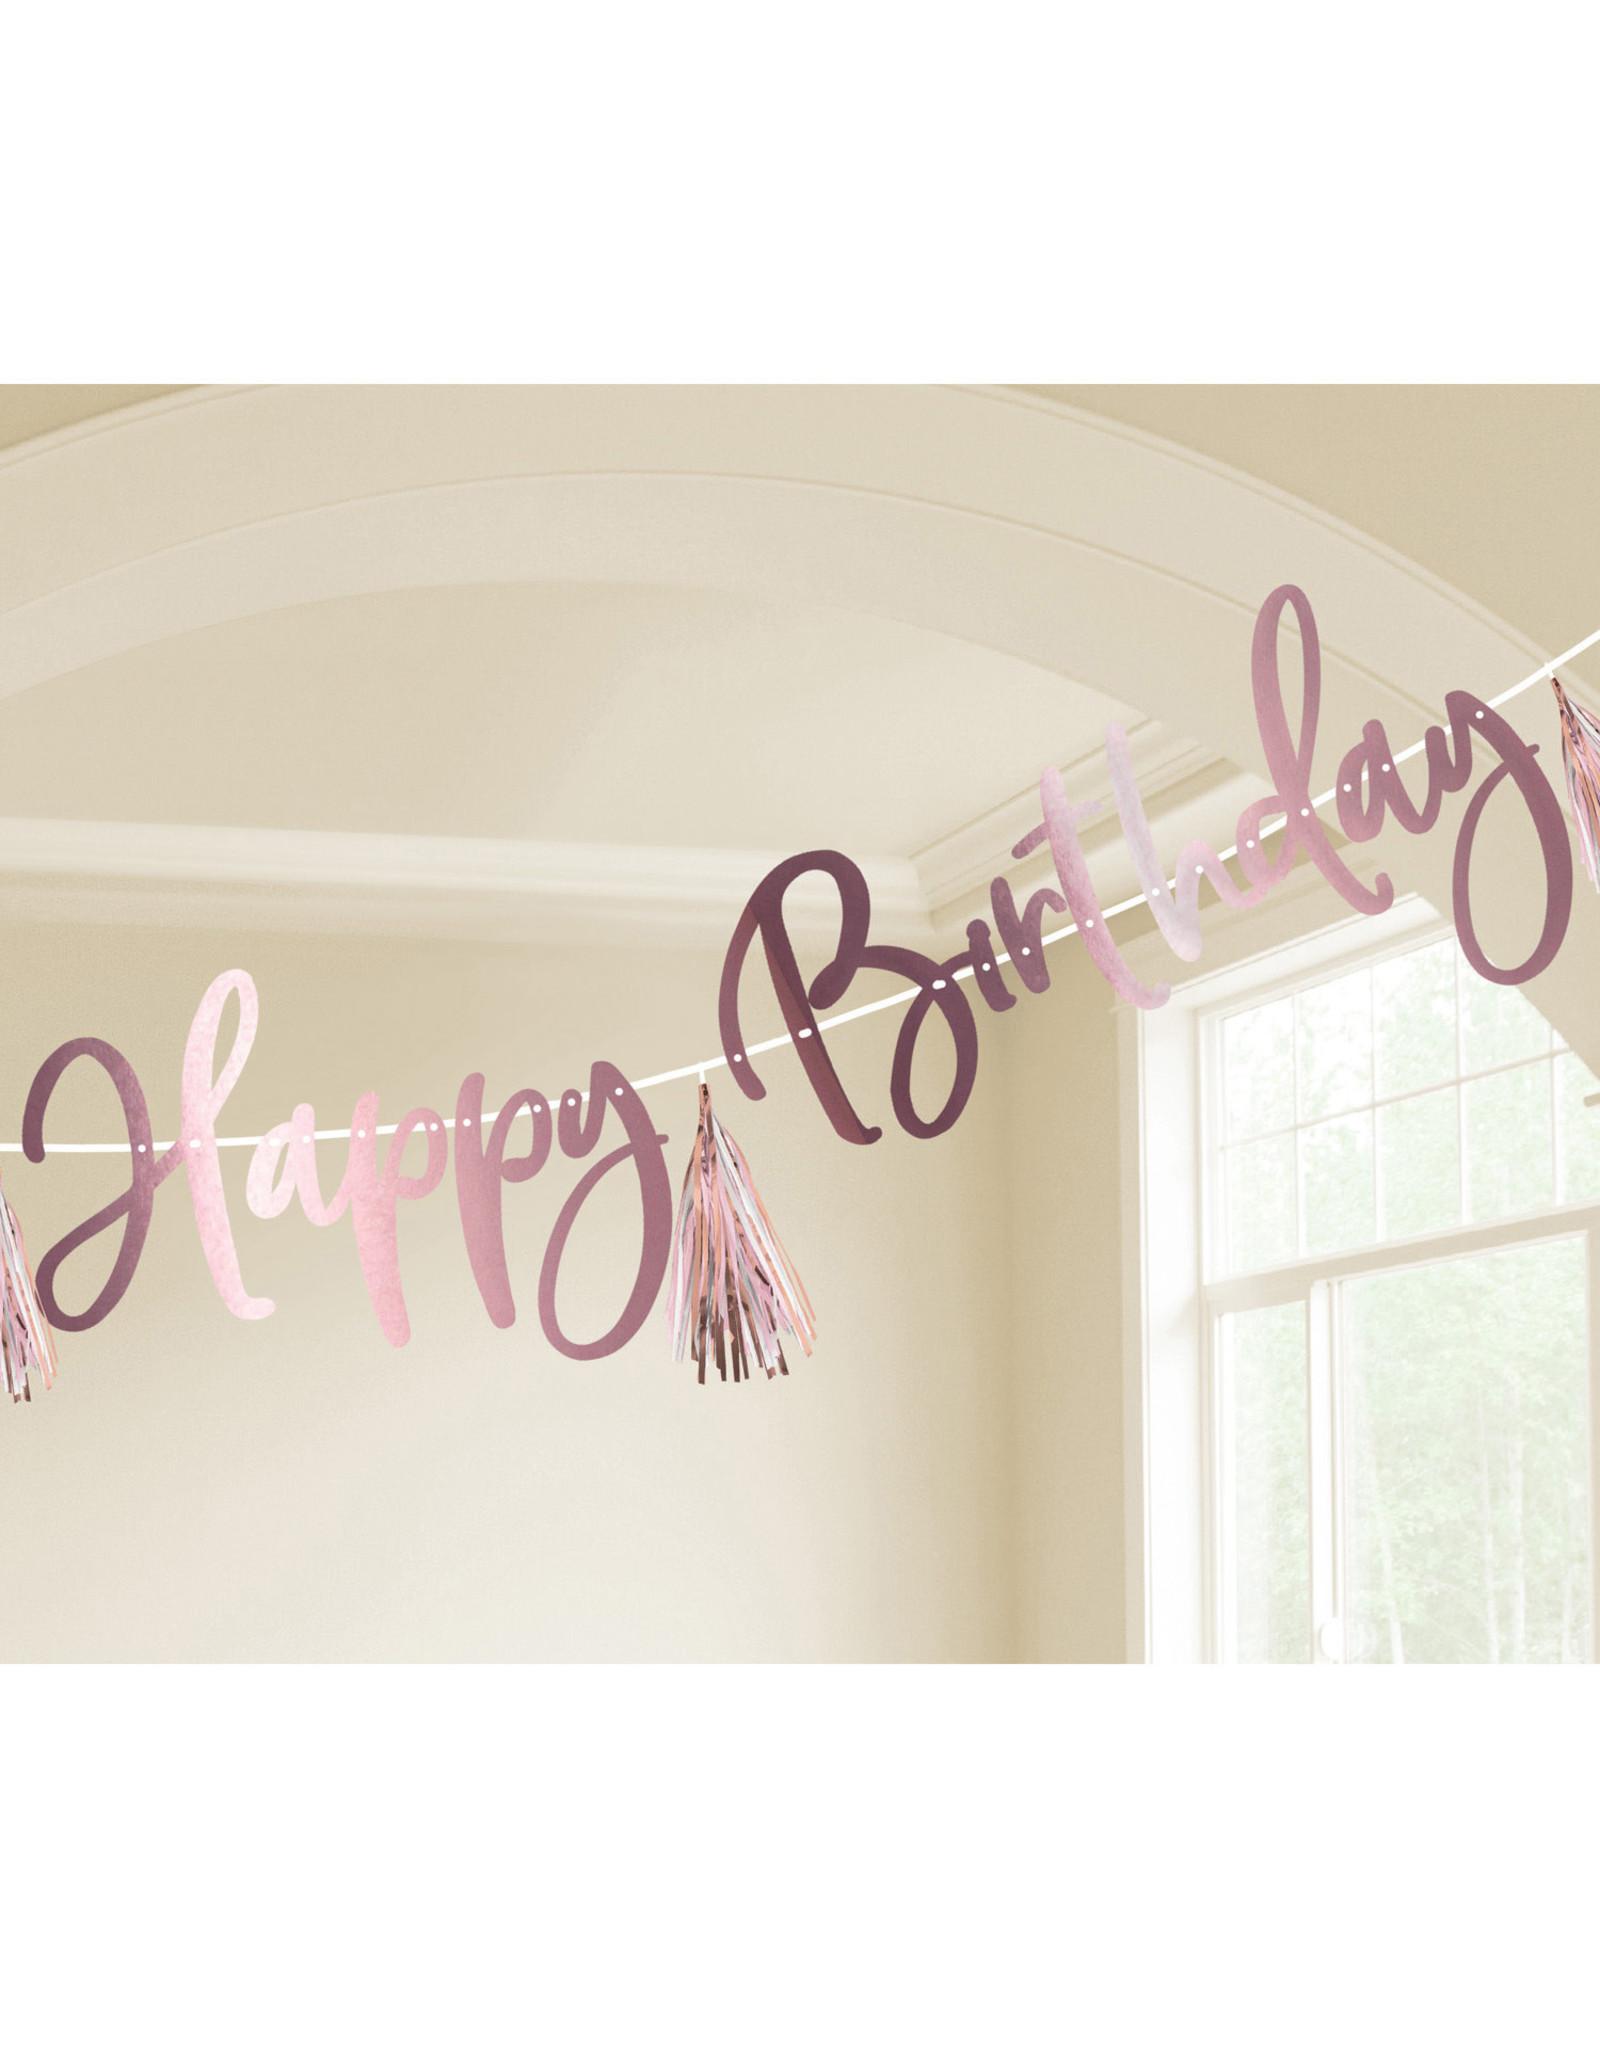 Amscan happy birthday banner kit DIY rose gold